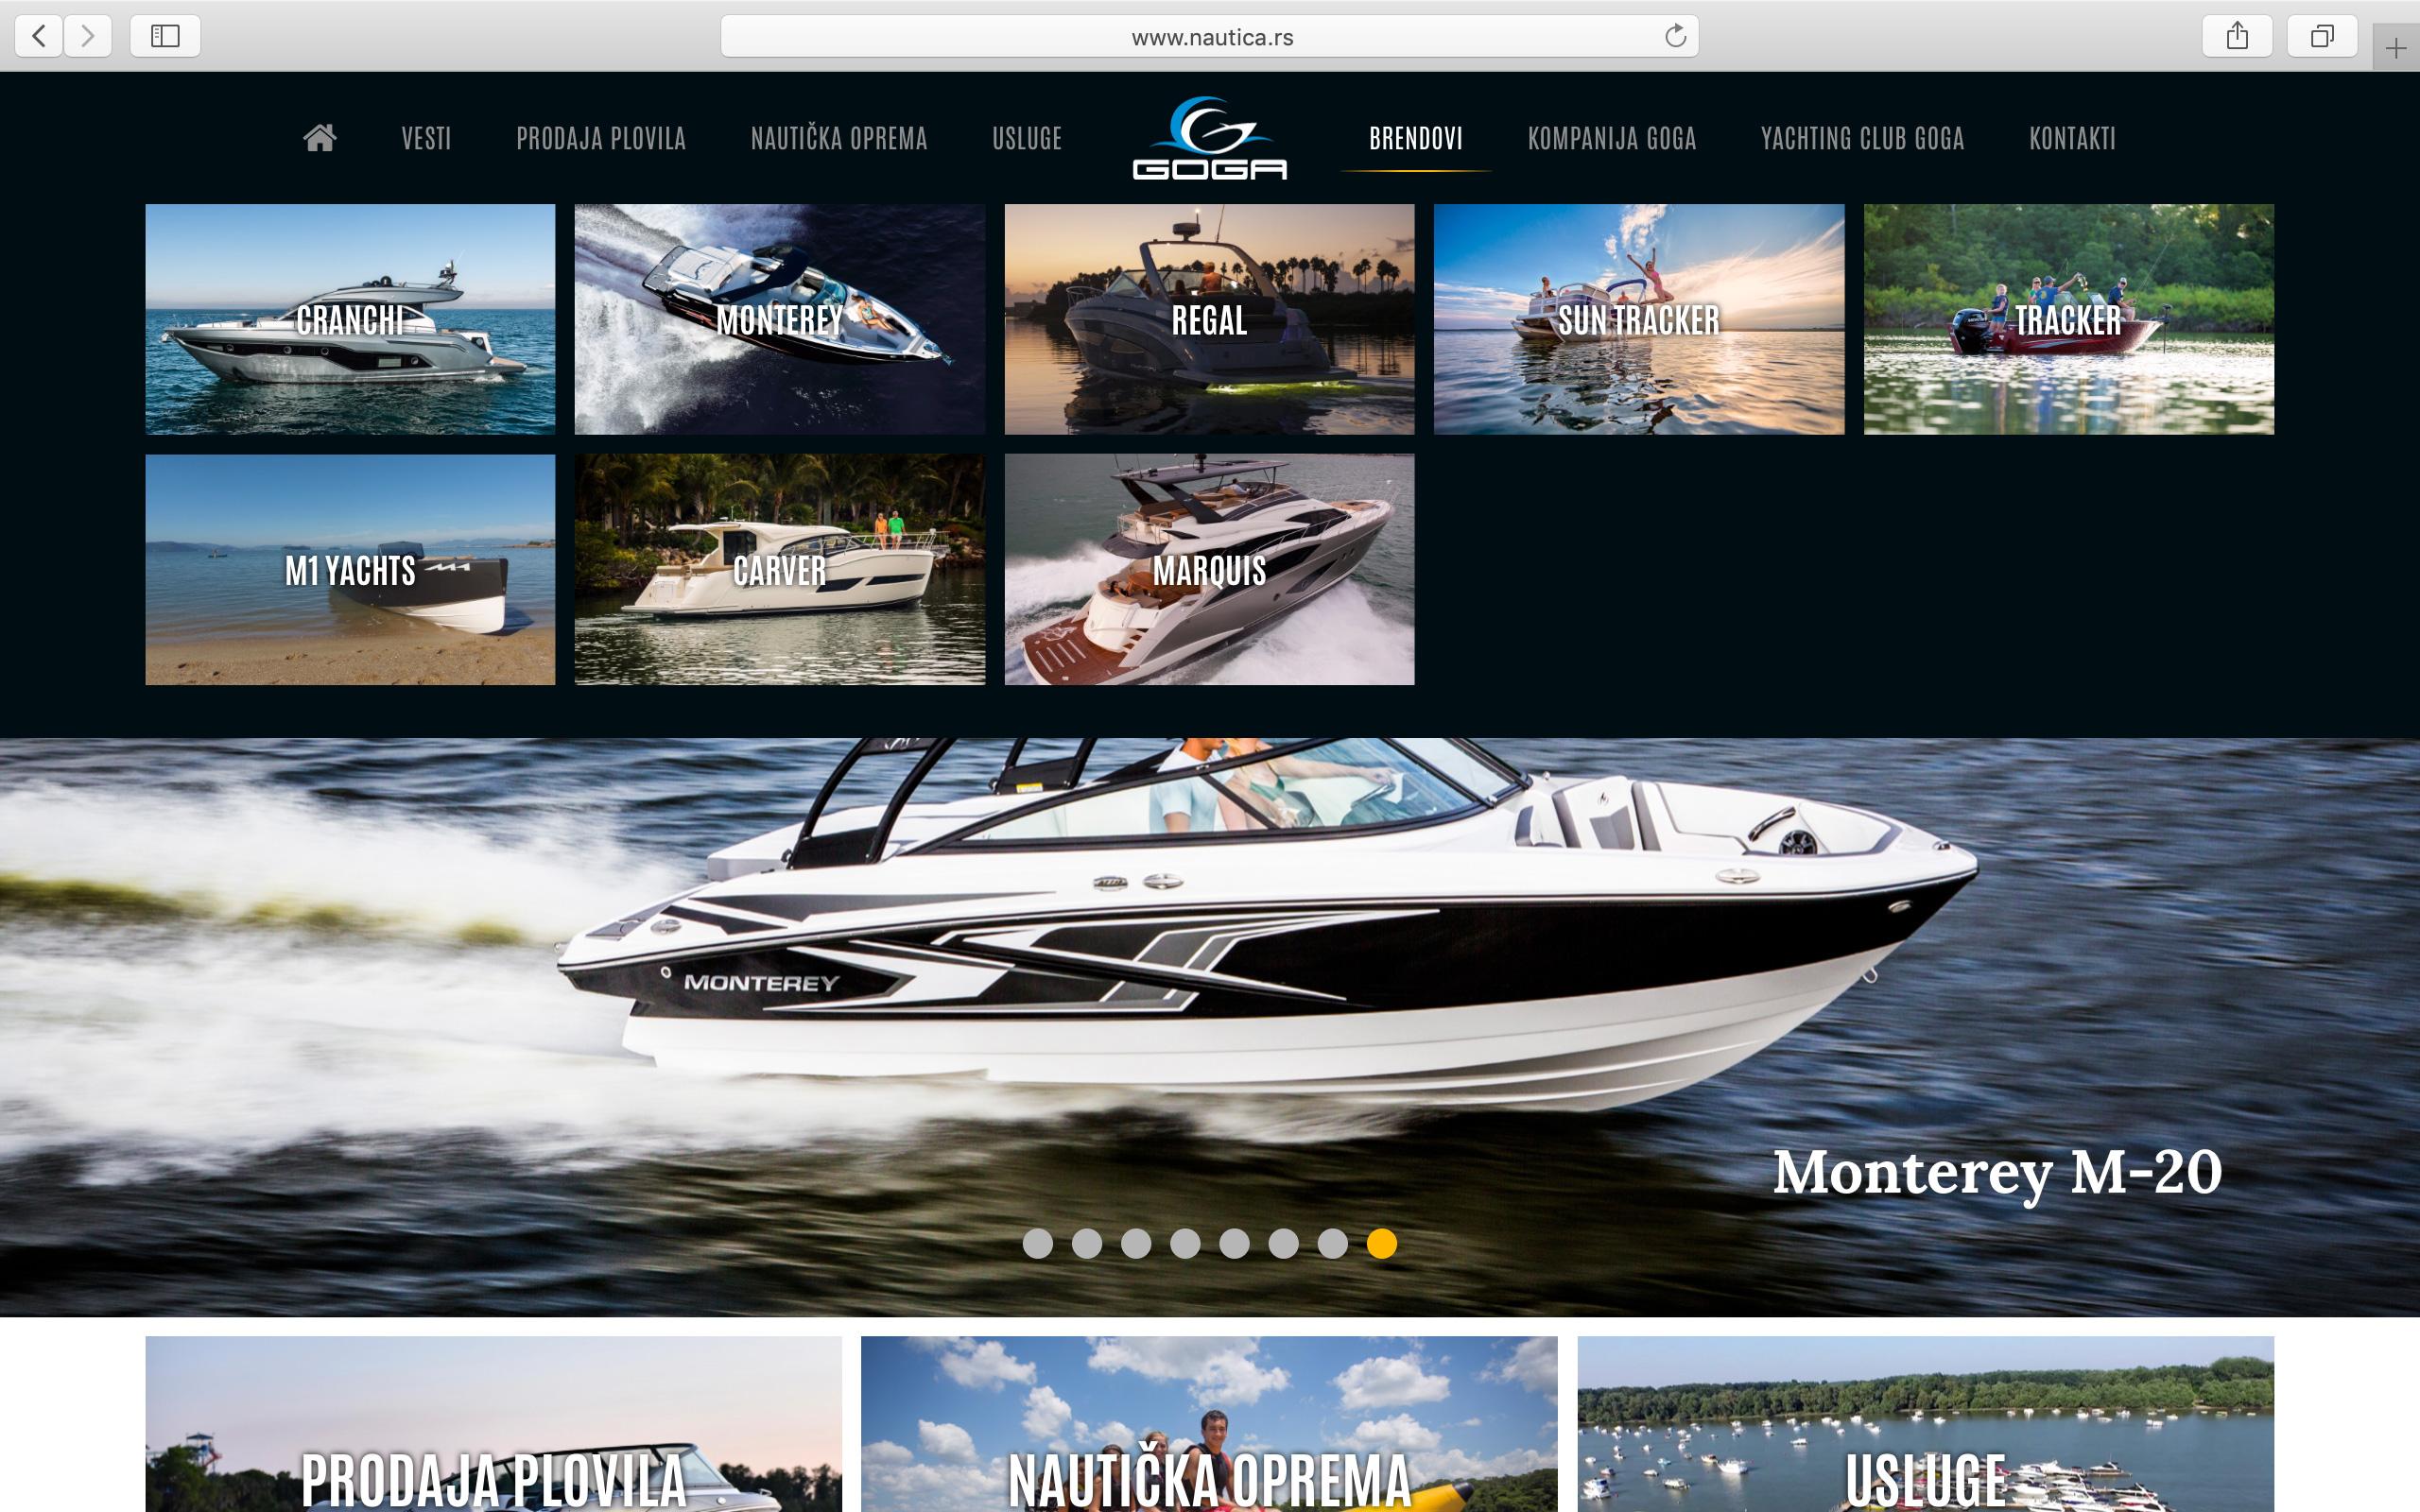 Kilmulis design - Goga Yachting Club - website 05